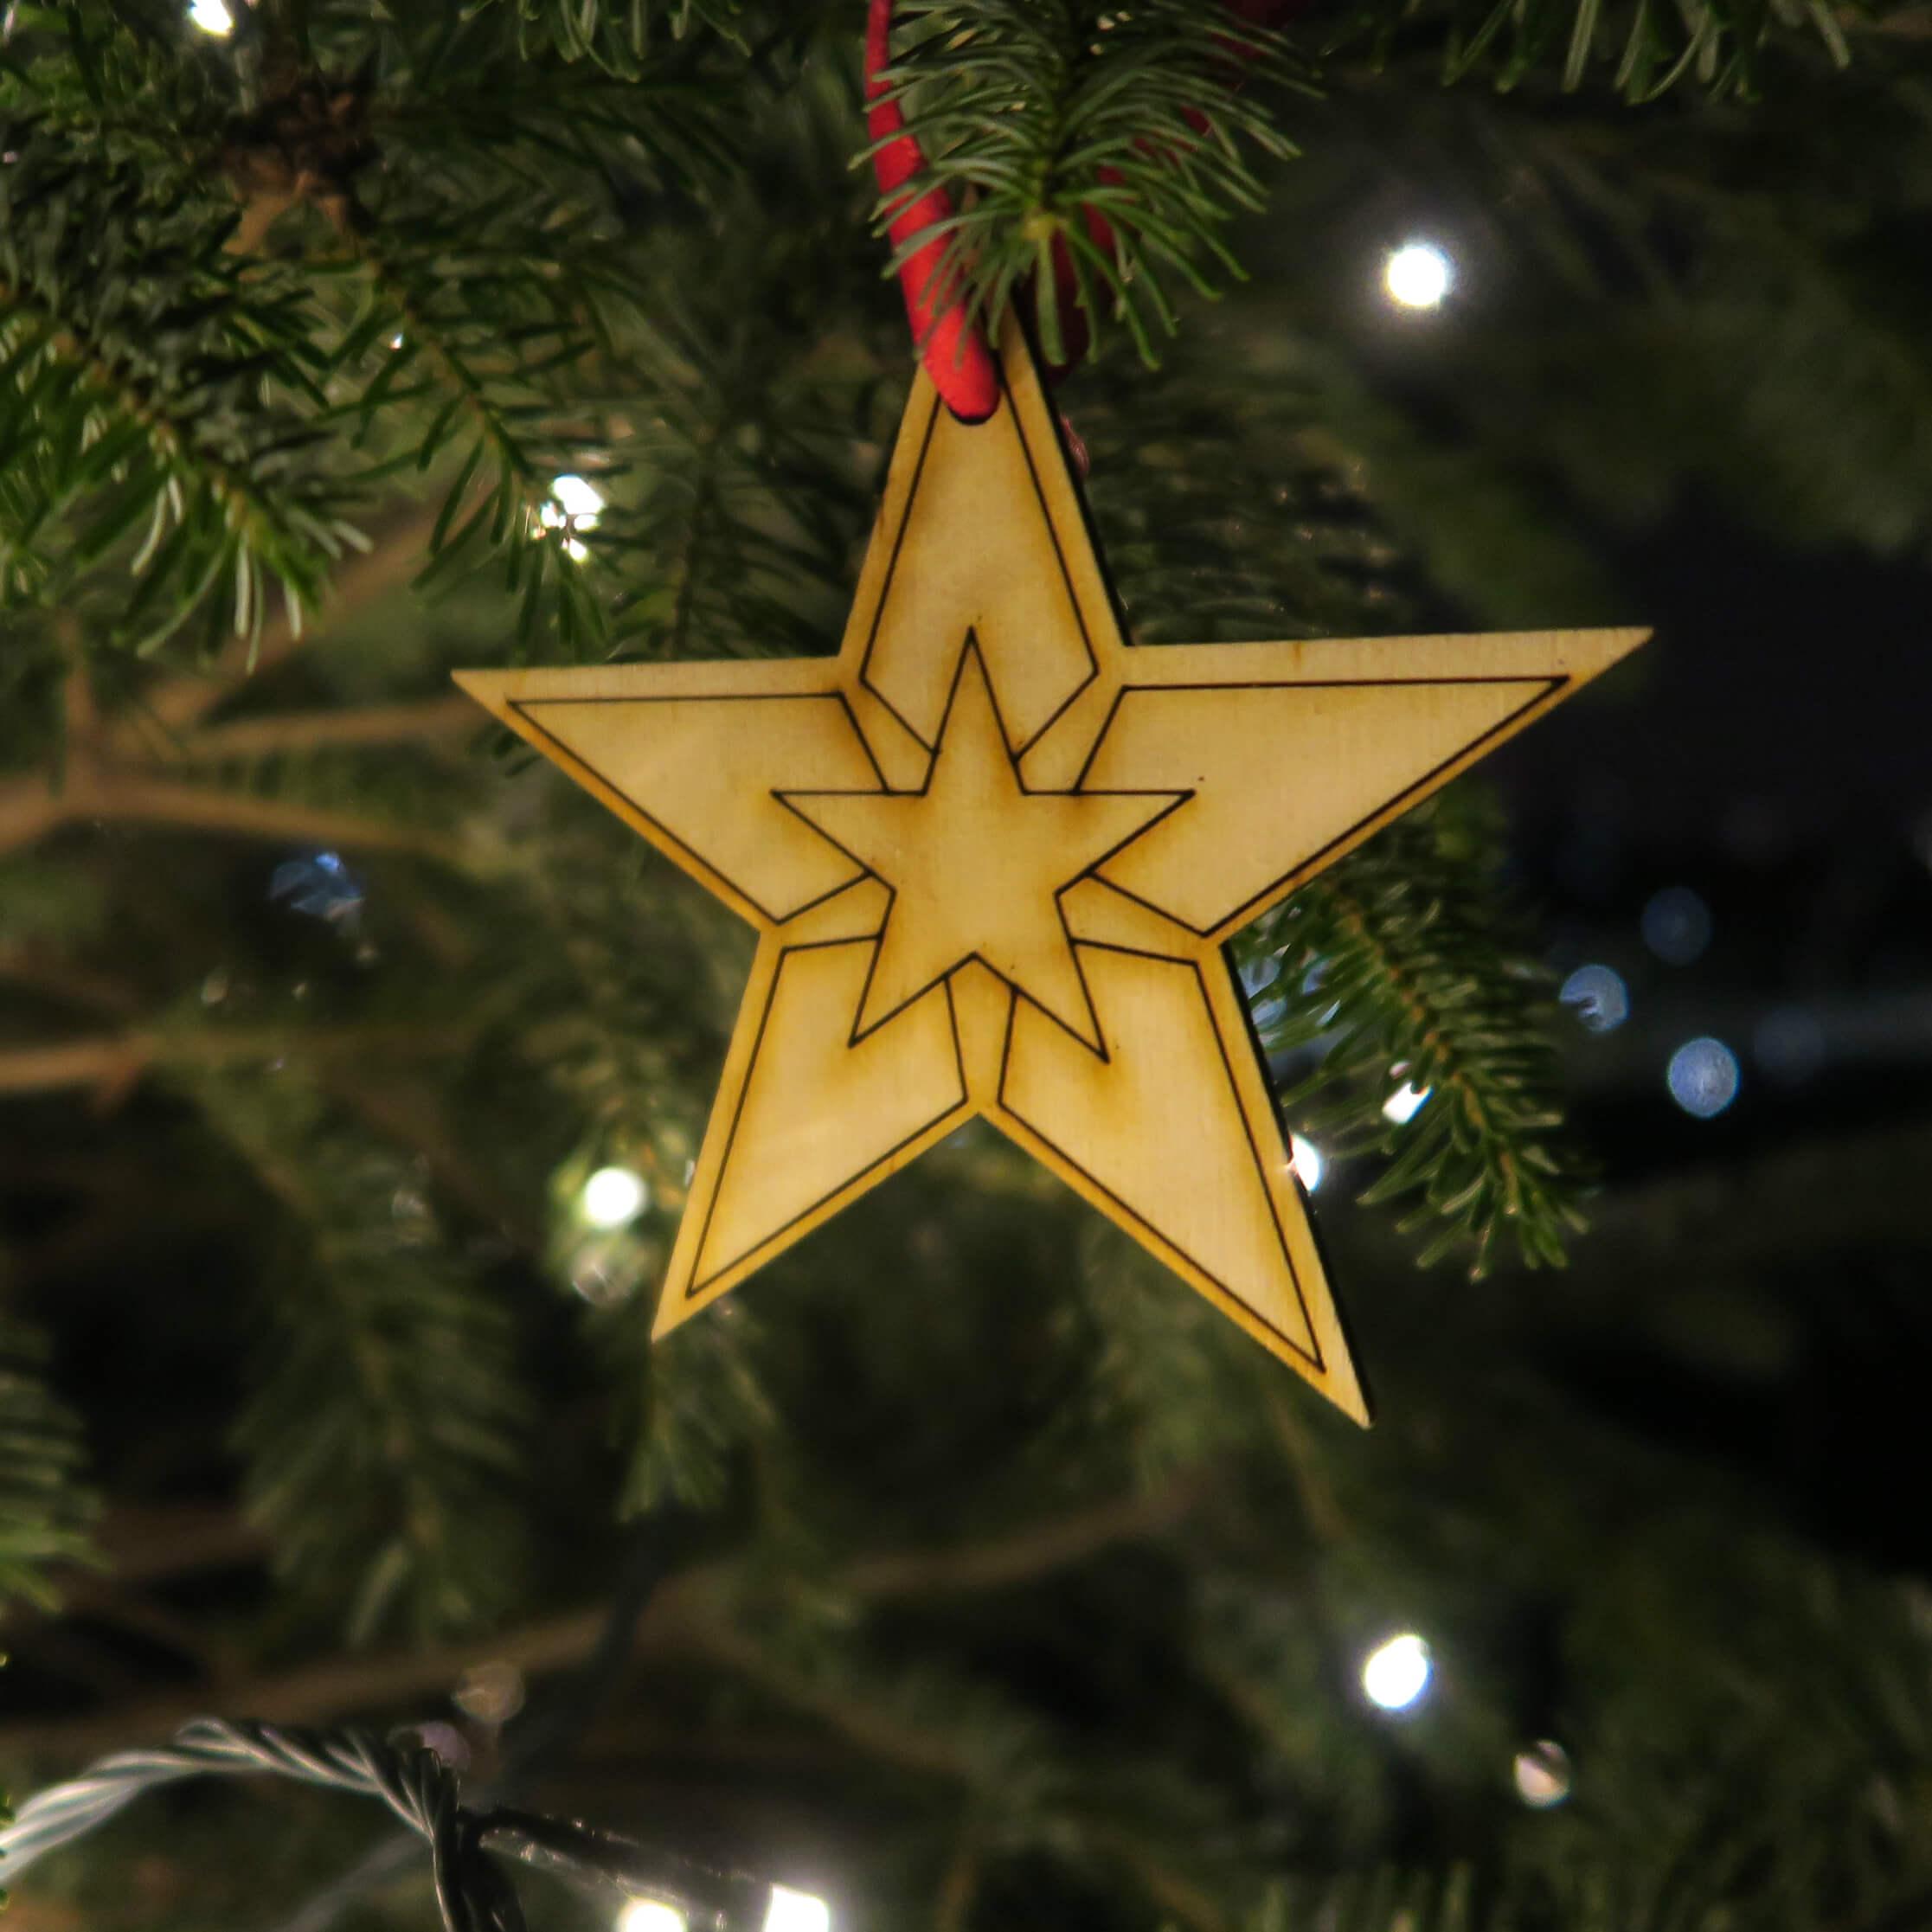 Christmas Star Save The Children Uk